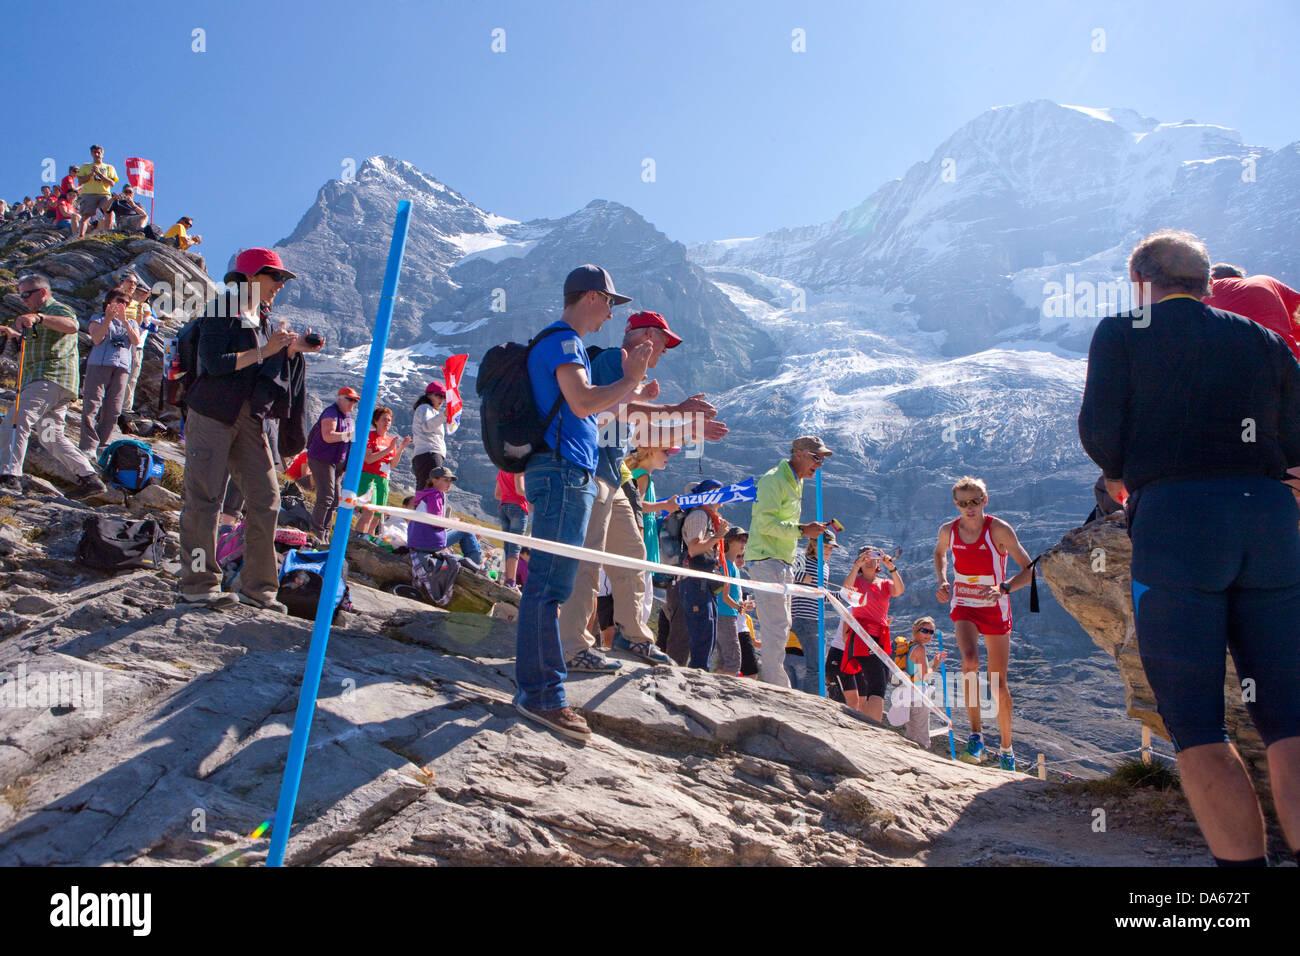 Jungfrau marathon, marathon, mountain run, run, sport, mountain scenery, landscape, mountain, mountains, mountain - Stock Image